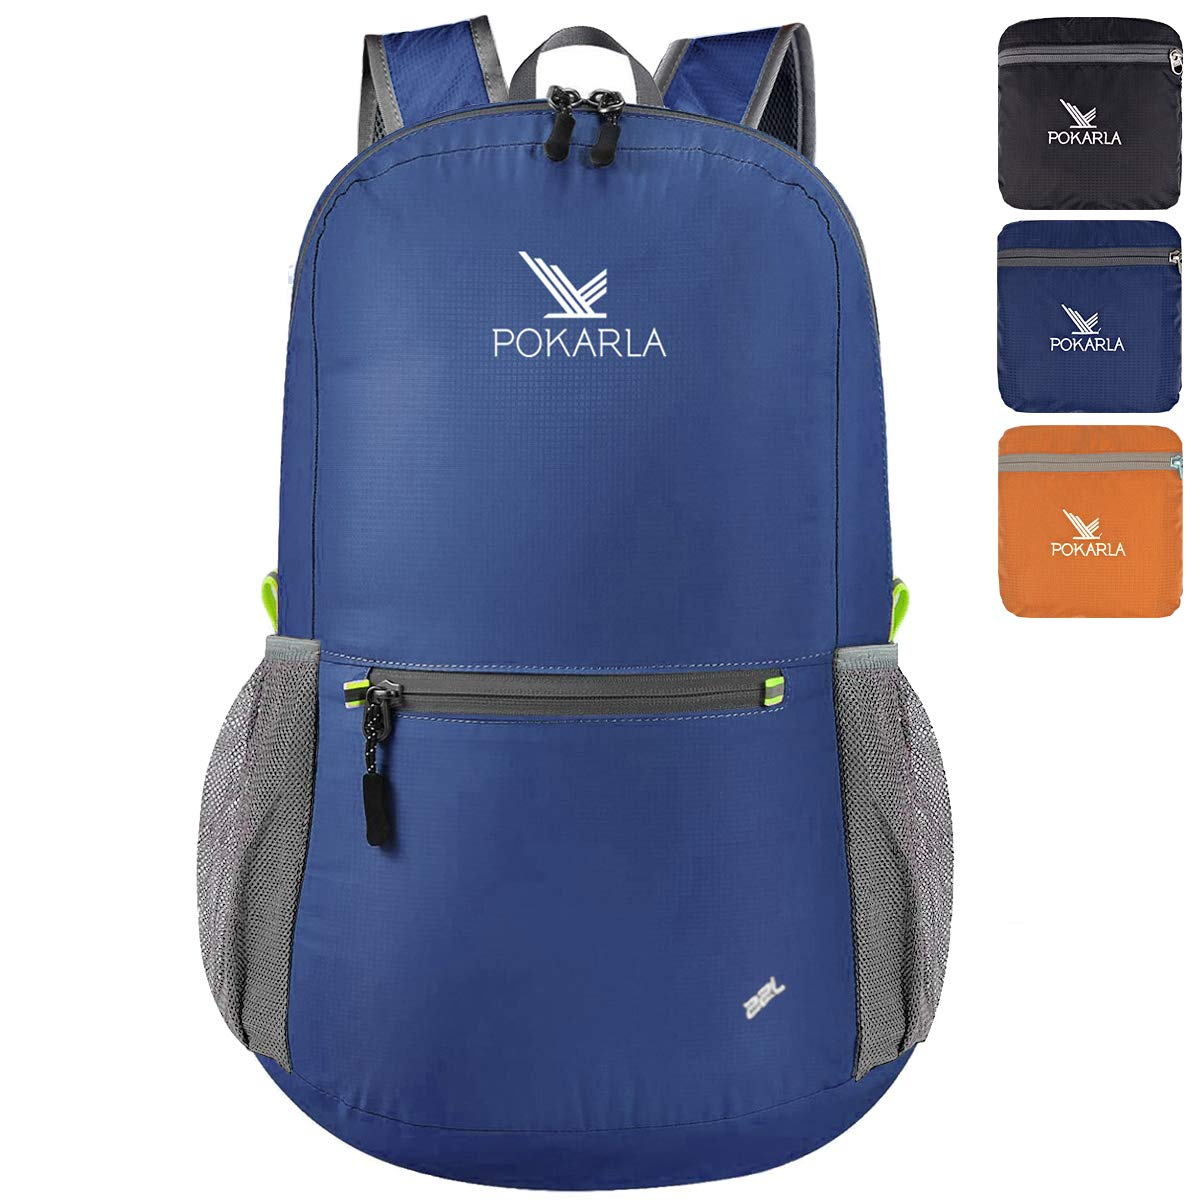 POKARLA 20L Hiking Backpack Lightweight Packable Water Resistant Travel Daypack